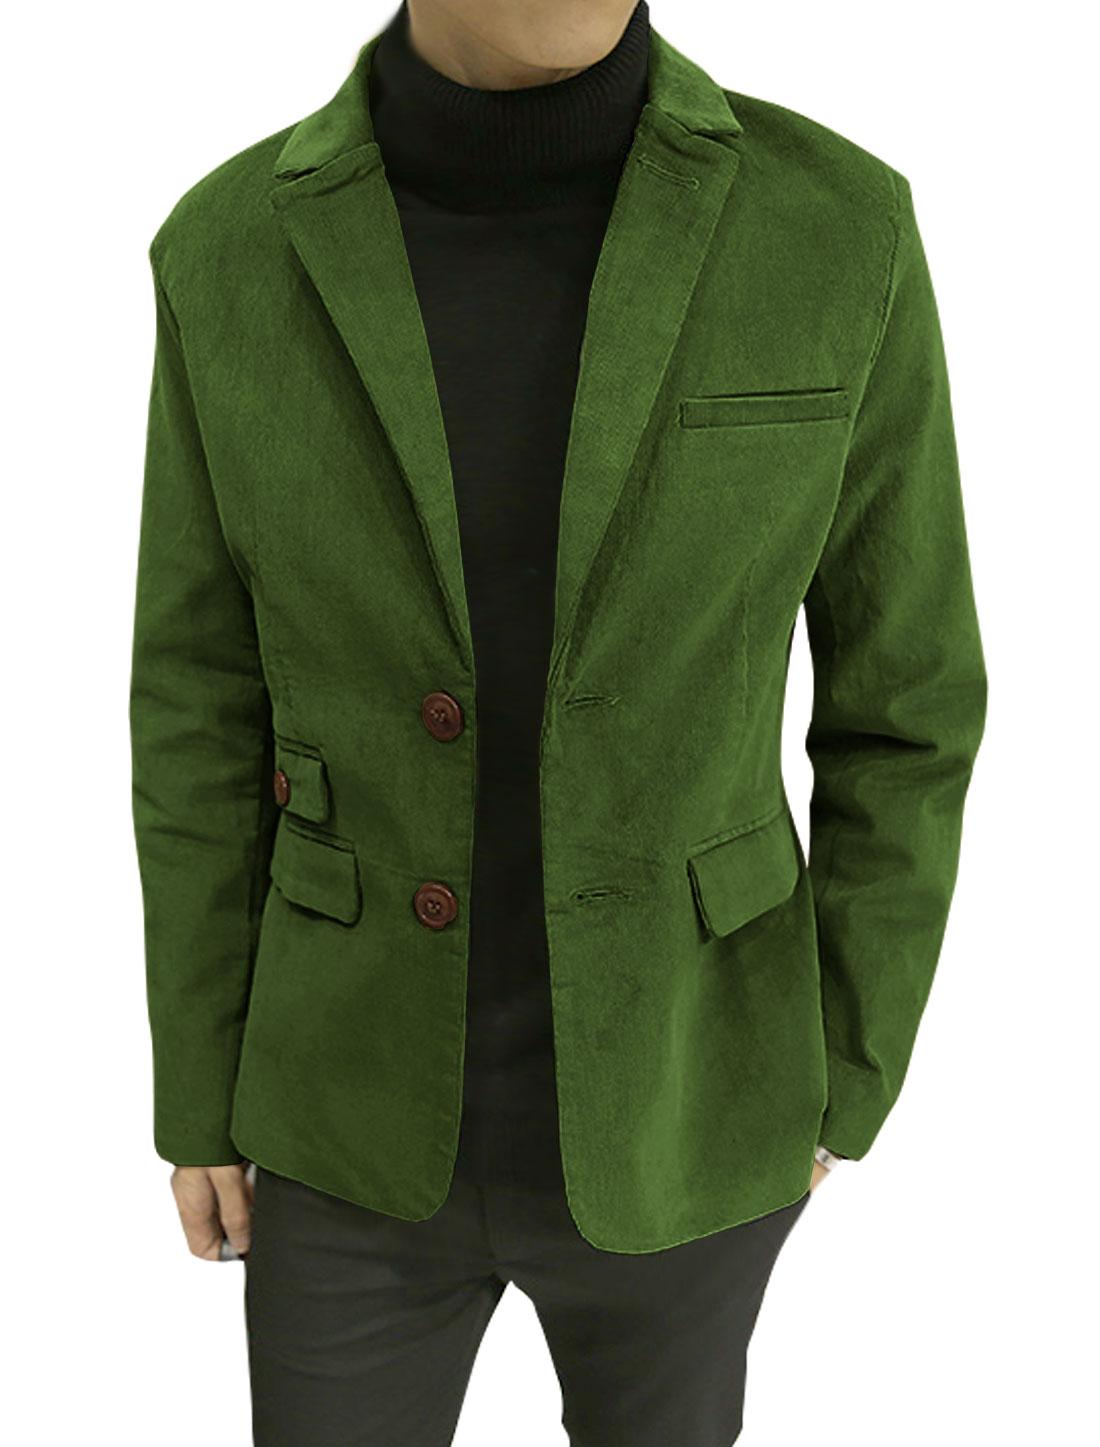 Men Notched Lapel Multi Pockets Split Sides Corduroy Blazer Jacket Green S